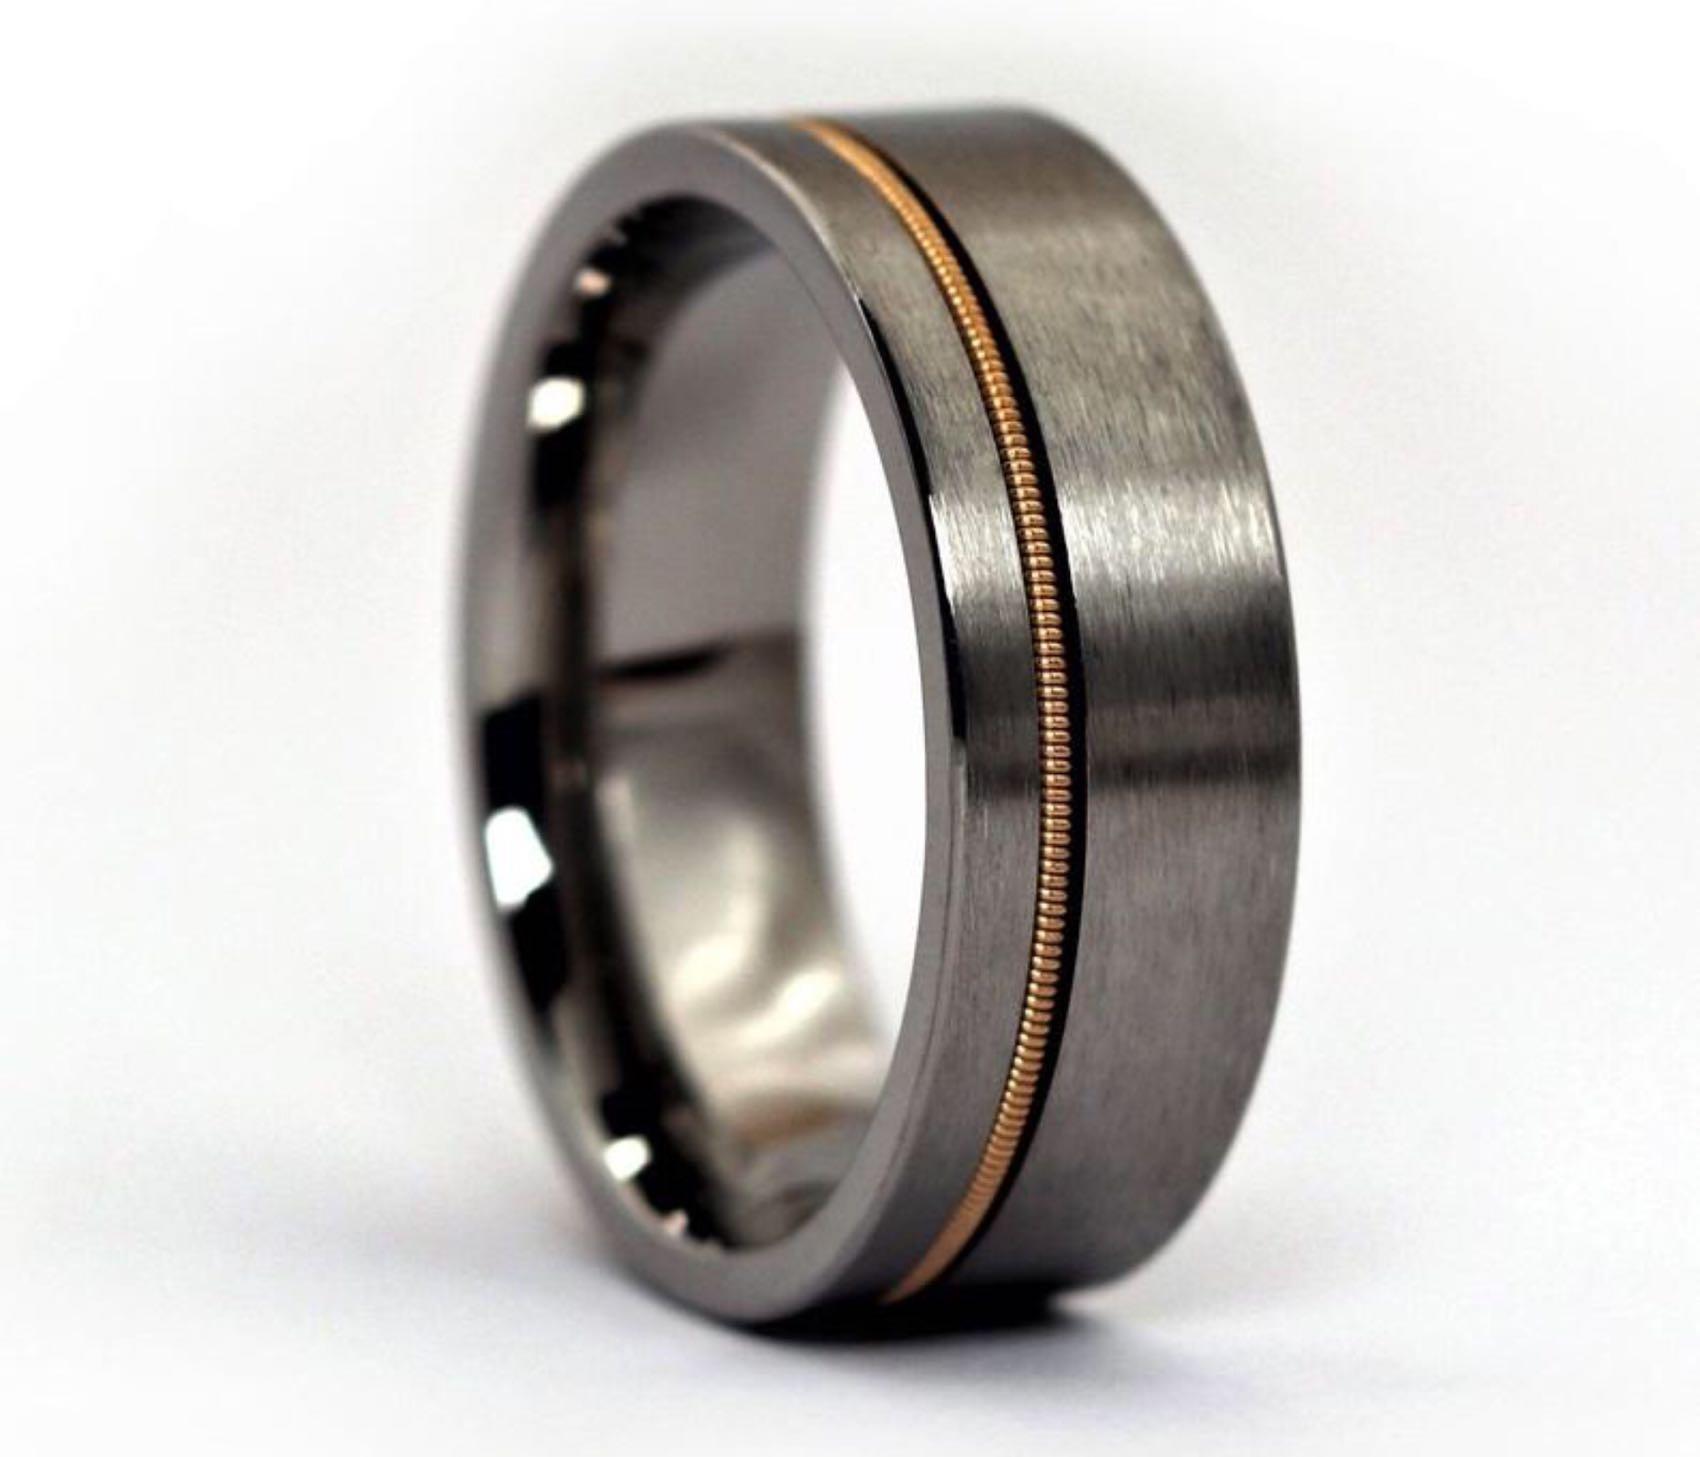 Anvil Rings guitar string ring. ($95 for black tungsten, $155 for titanium)